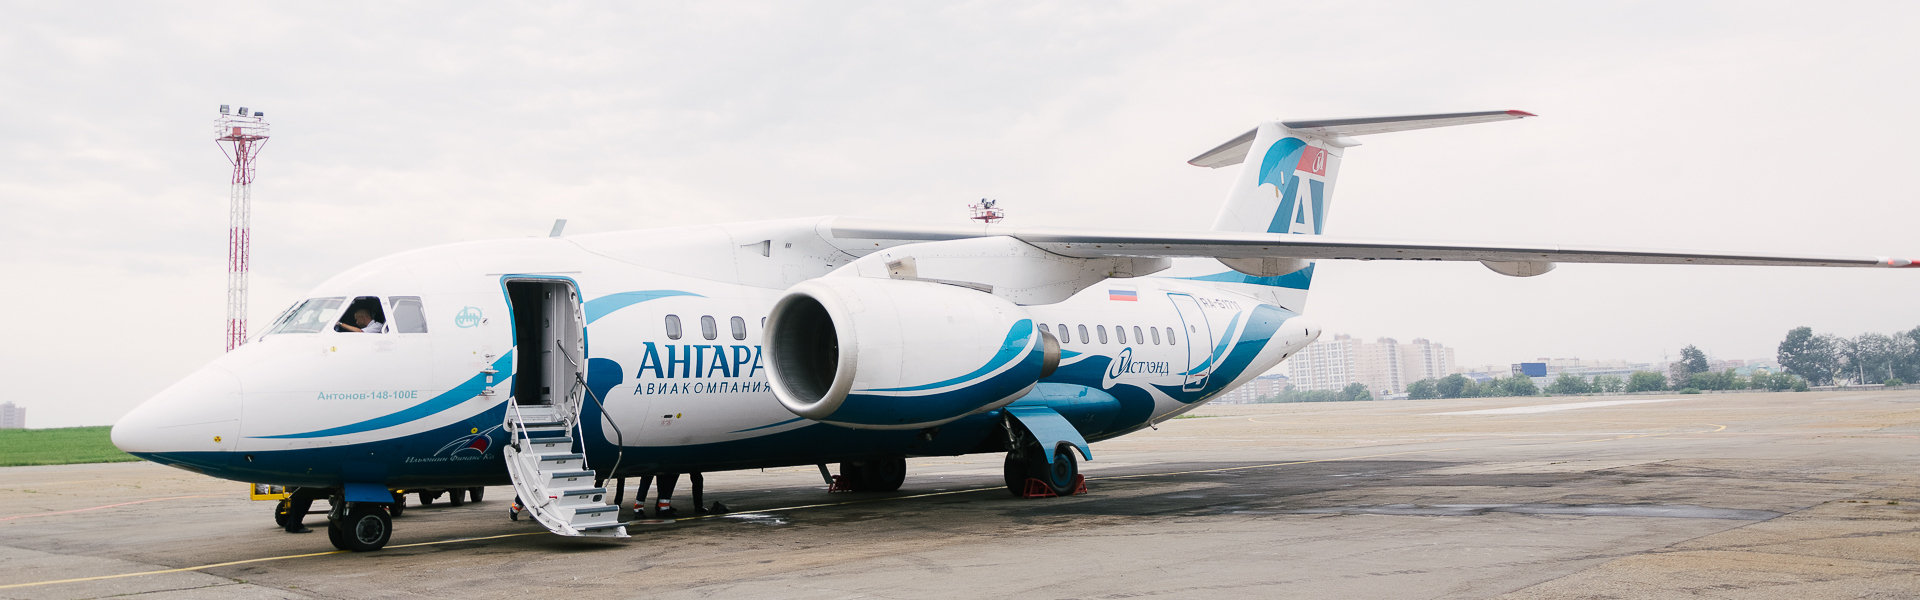 Ан-148 авиакомпании «Ангара». Фото Никиты Пяткова